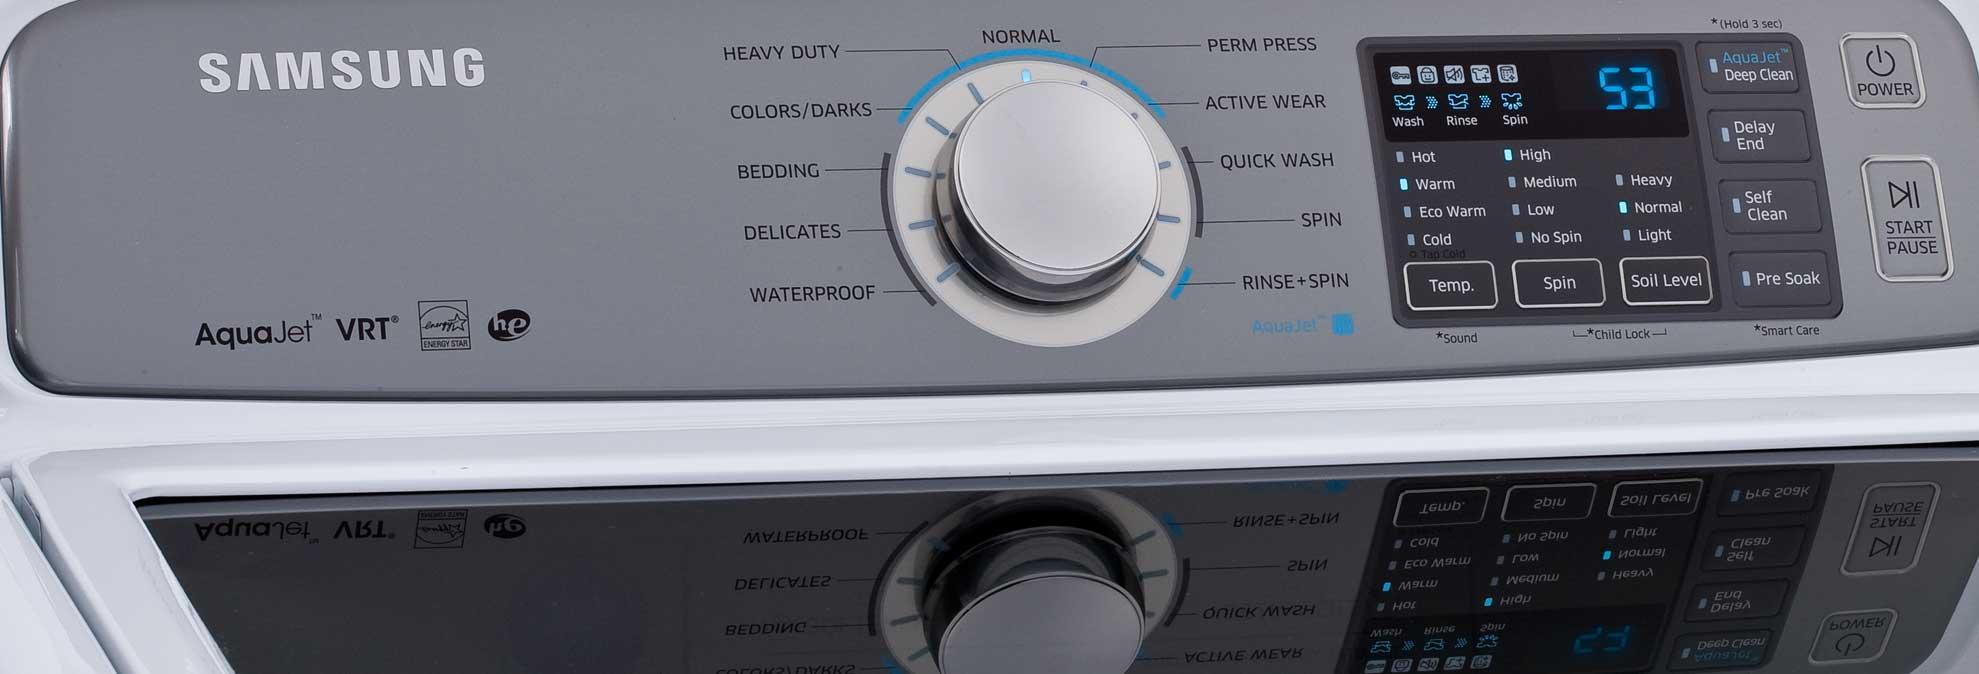 Samsung Recall TopLoading Washing Machines  Consumer Reports